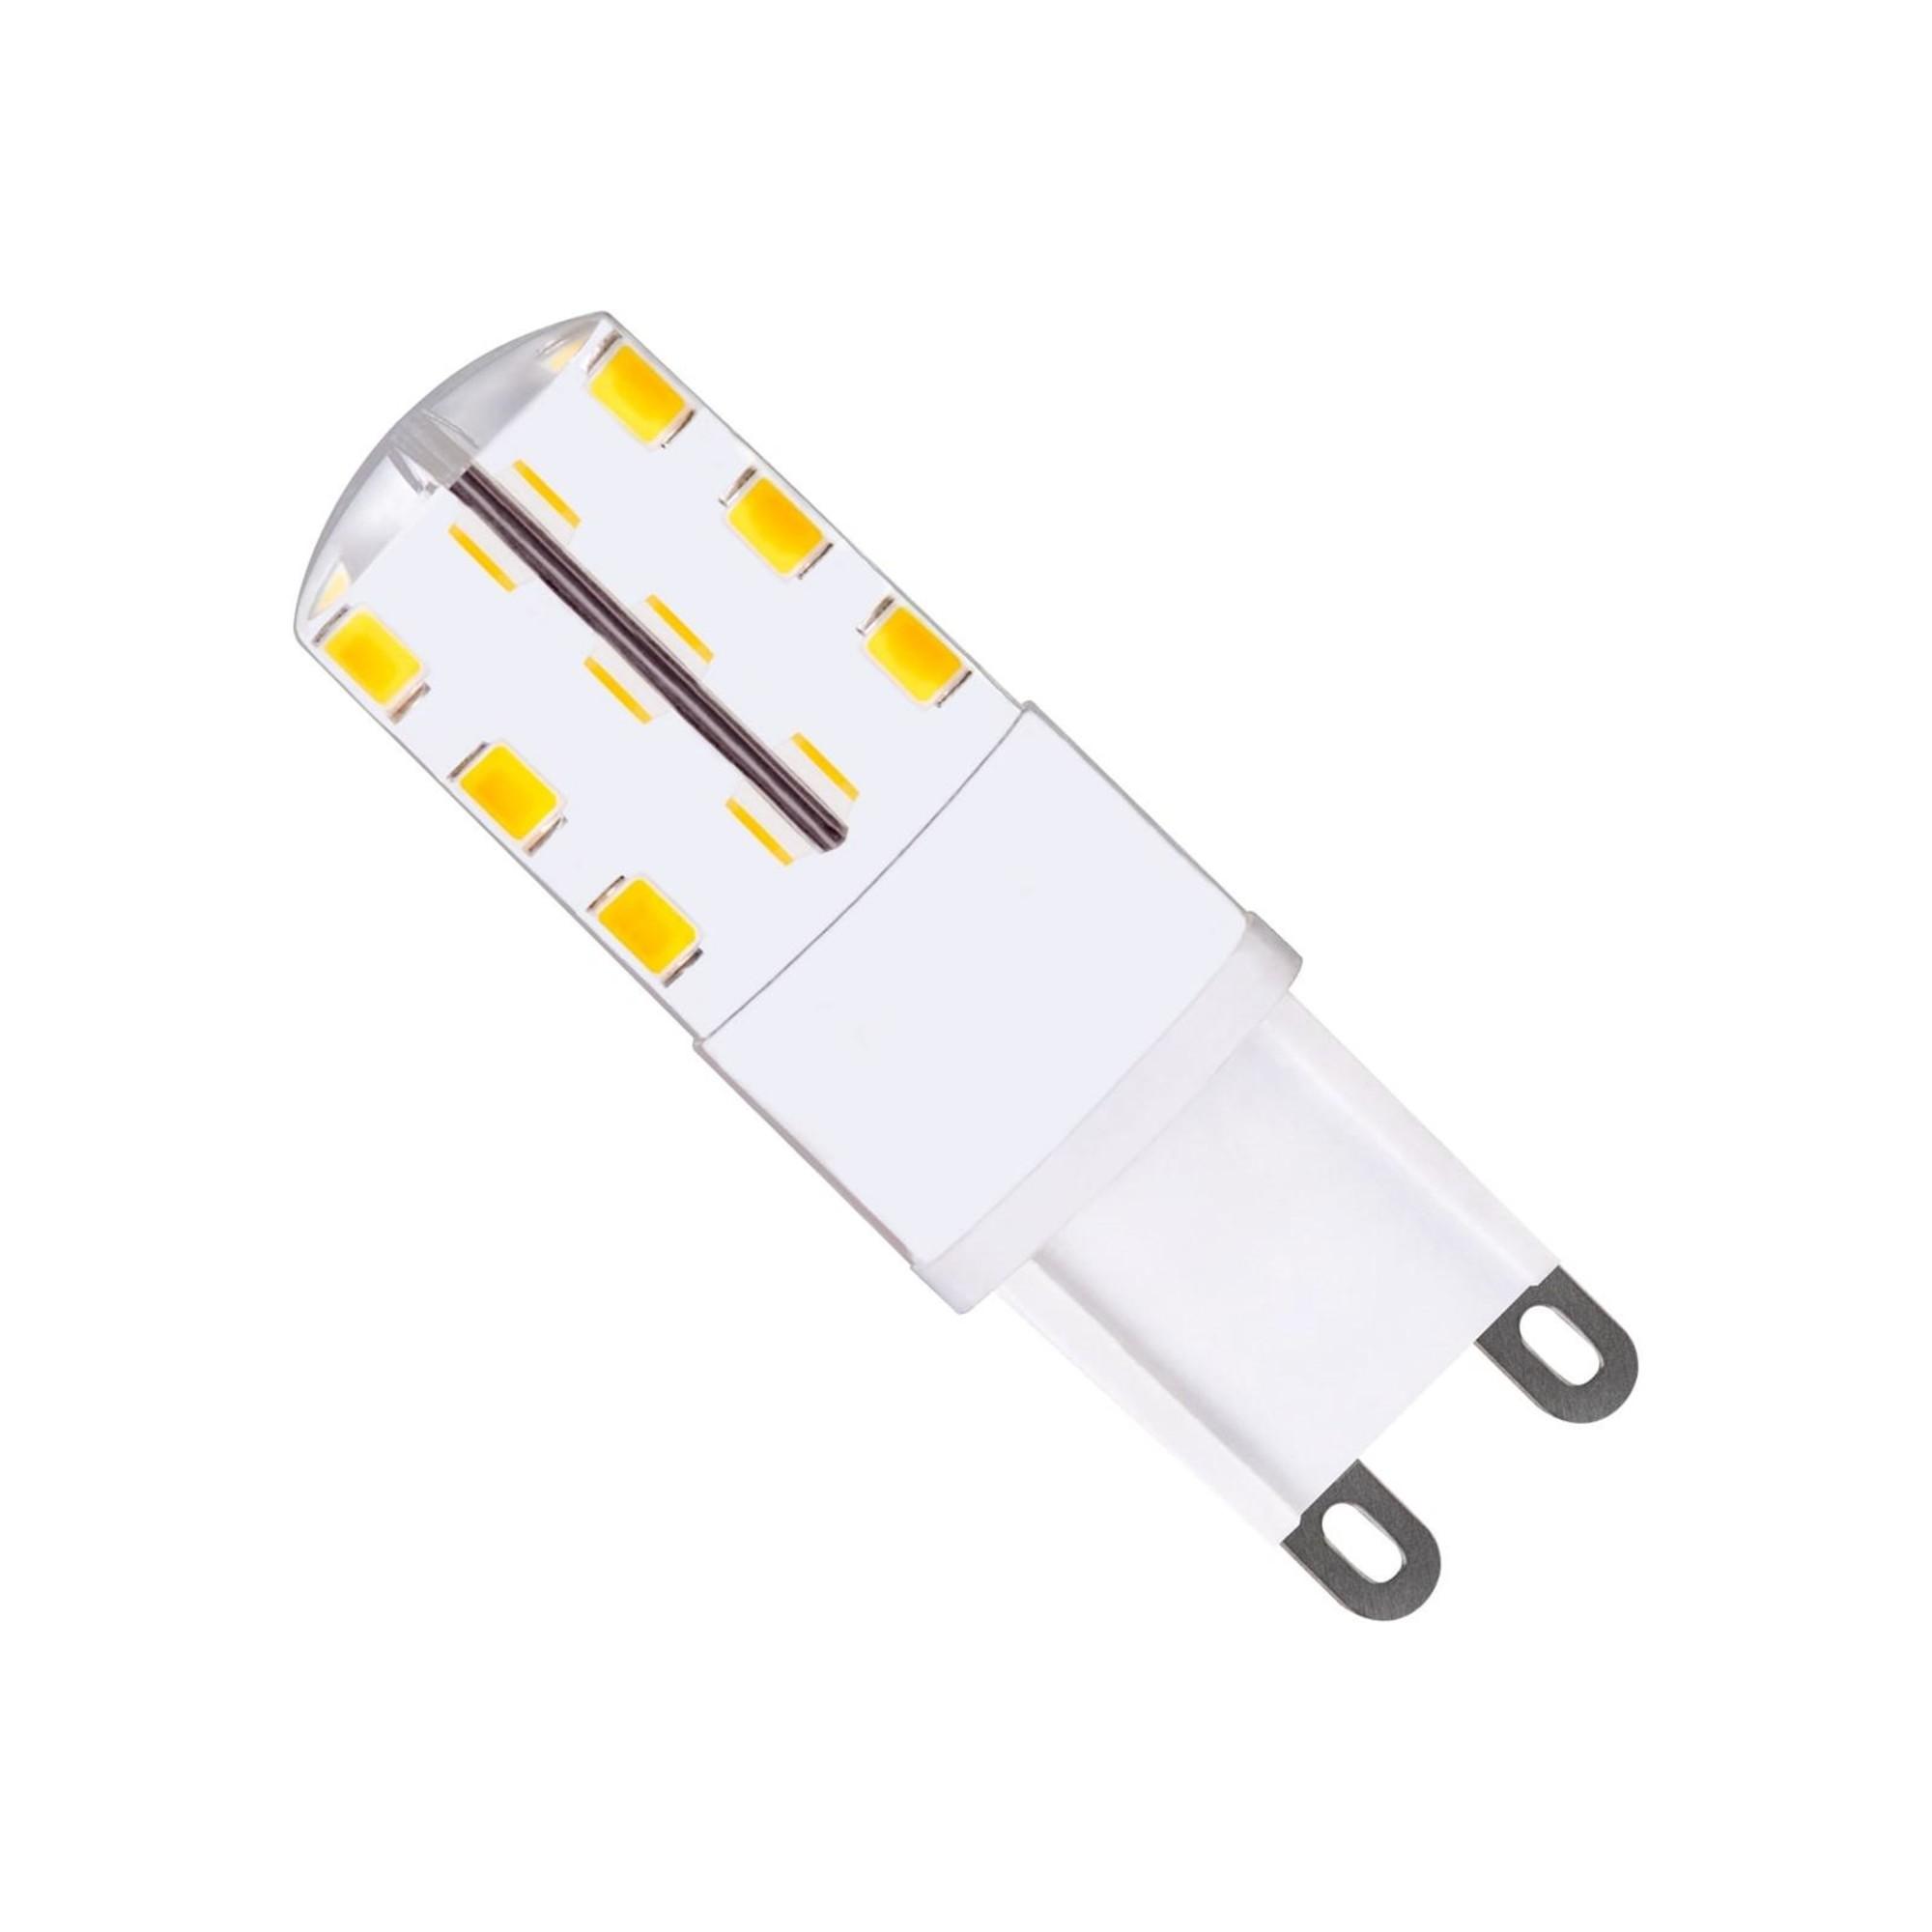 Лампа светодиодная (комплект 5 шт.) REV JCD G9 1.6W 3000K 32439 3